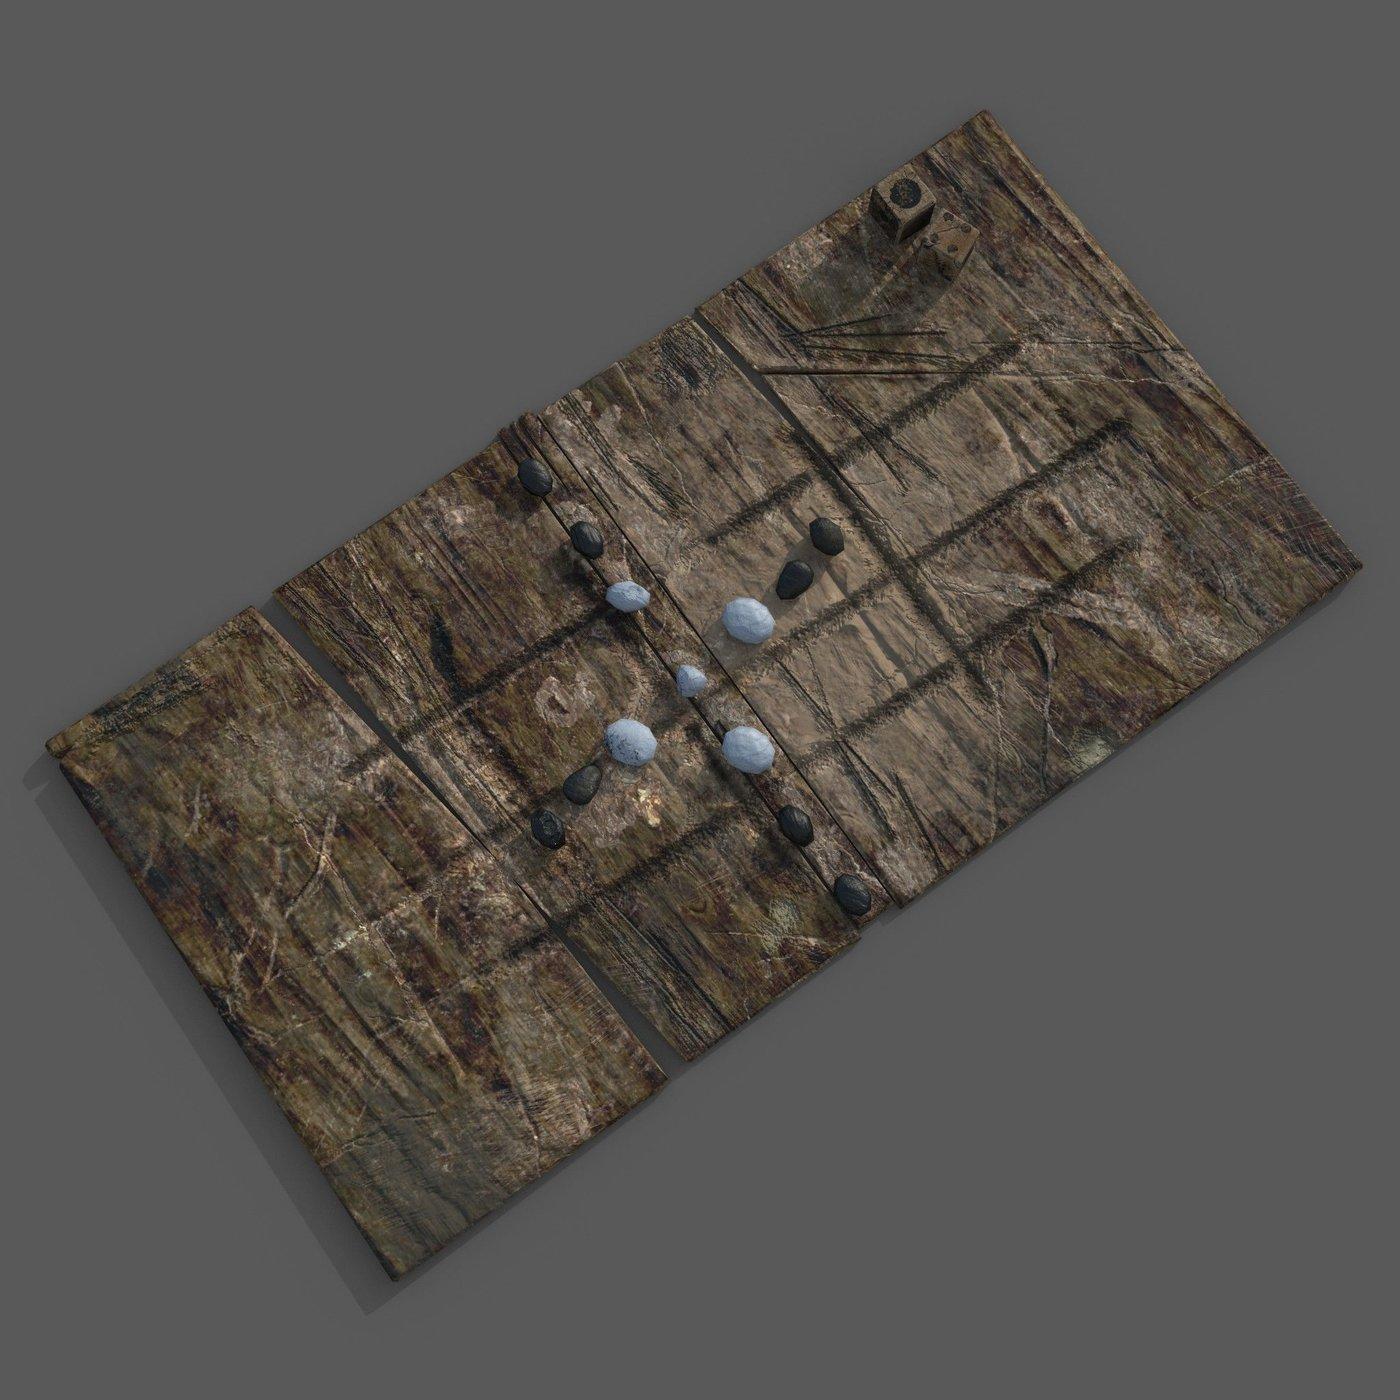 Medieval game board